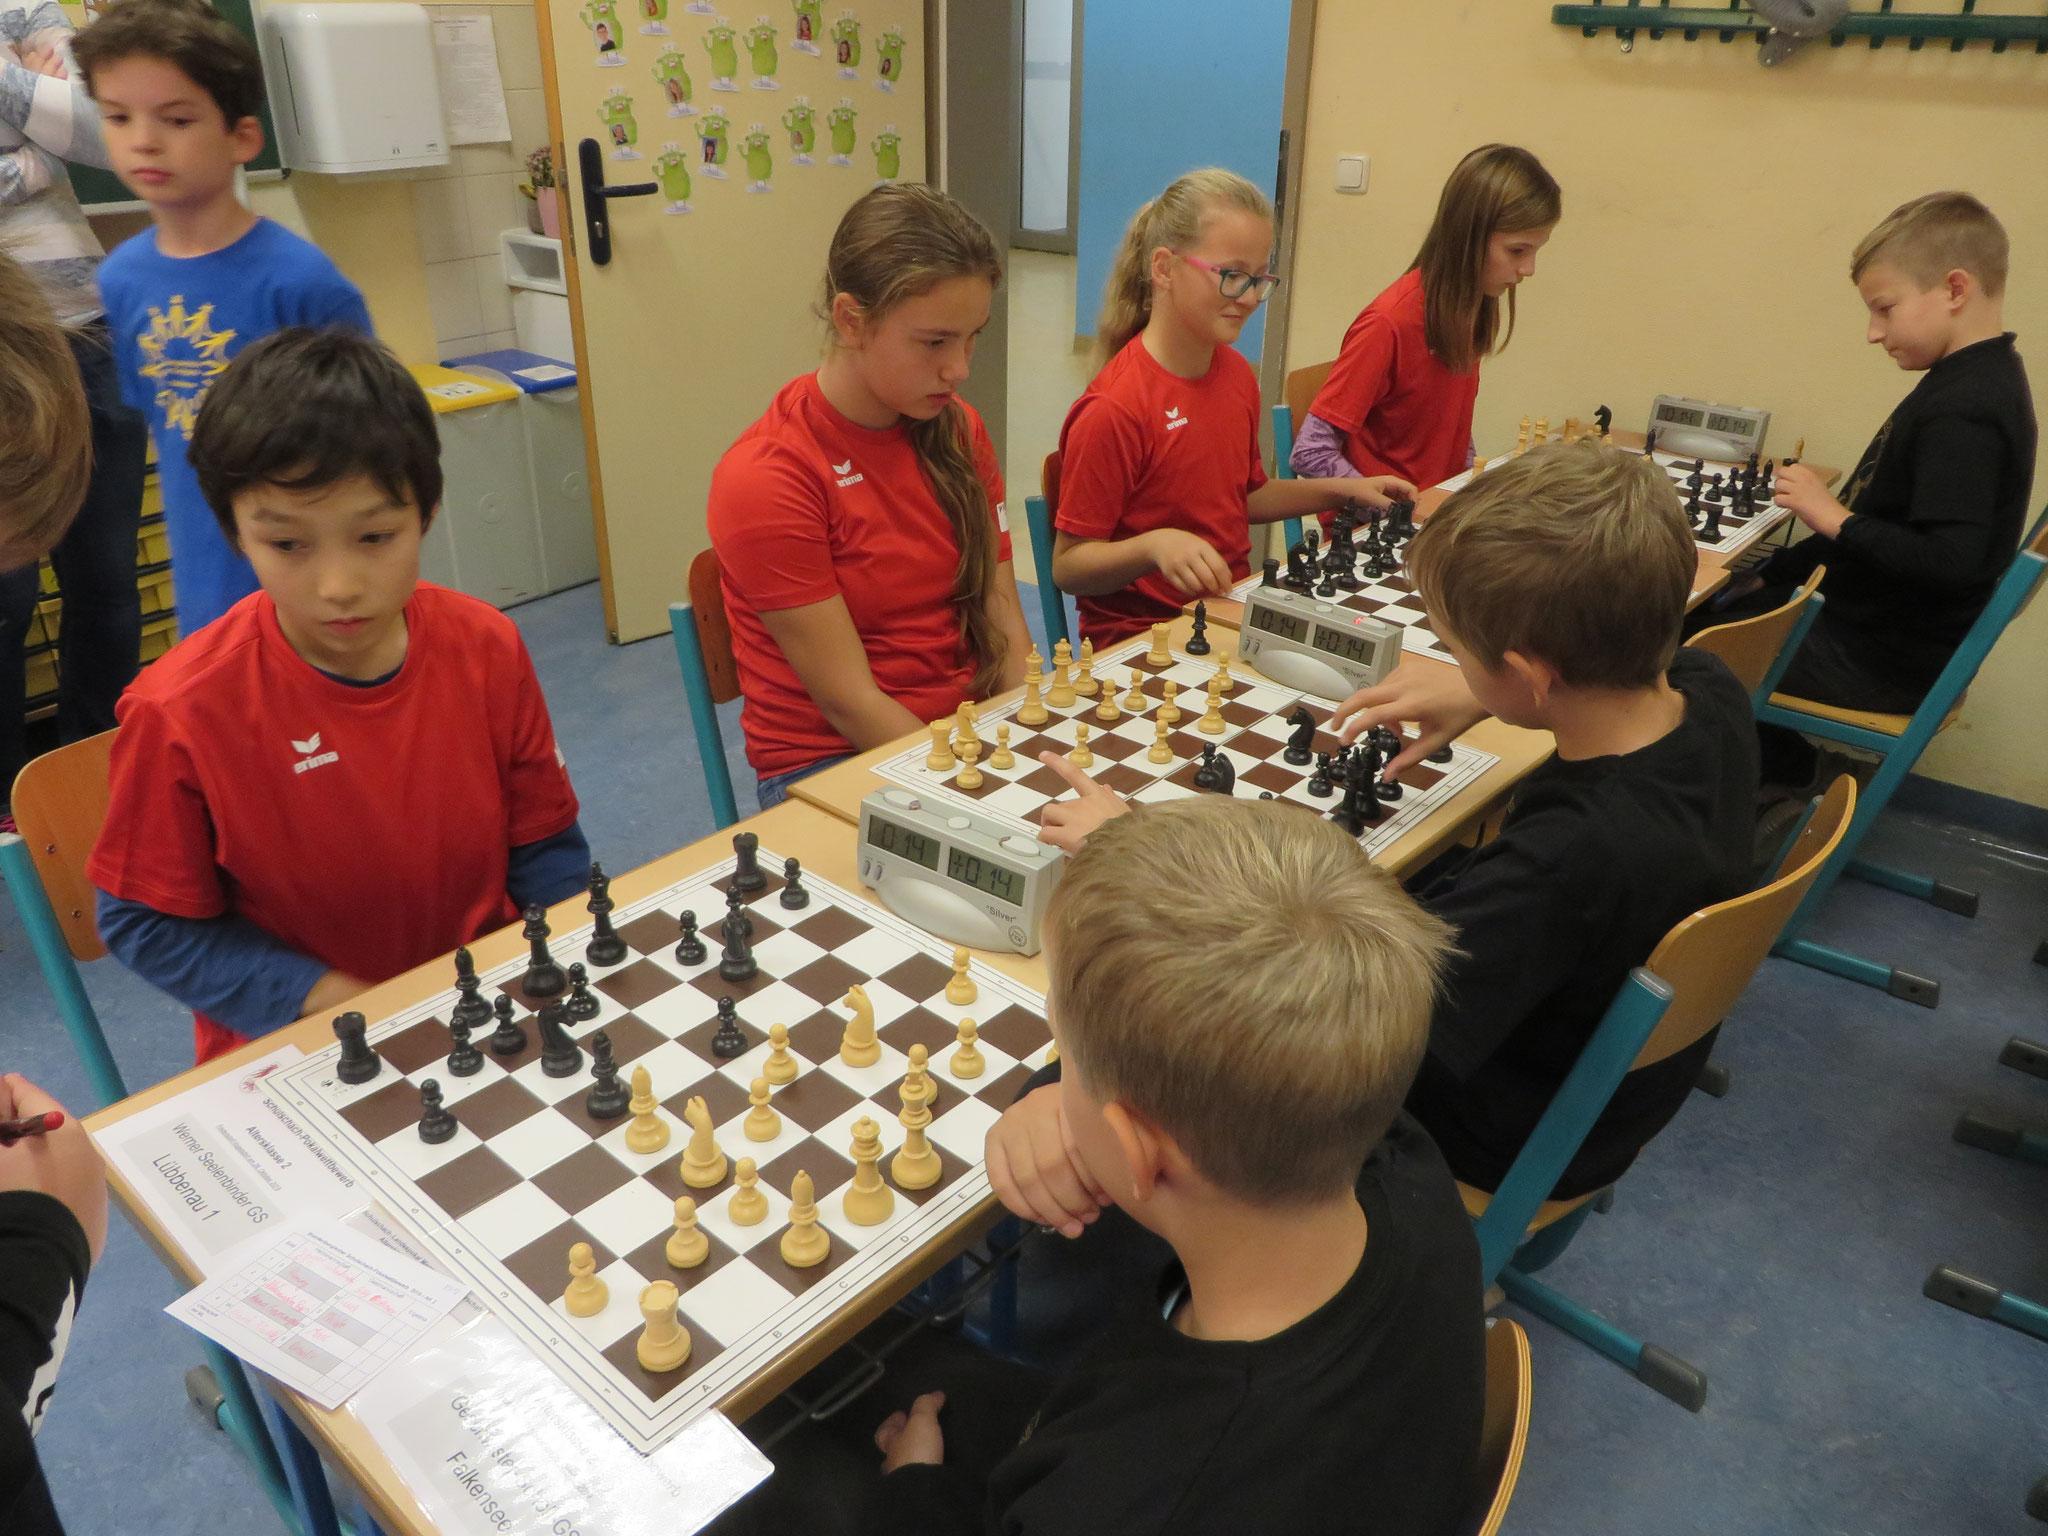 AK 2 : Das Team der Werner-Seelenbinder-GS I in Runde 7 mit Henry (Brett 1) , Aleksandra (Brett 2) , Anna (Brett 3) und Marie (Brett 4)